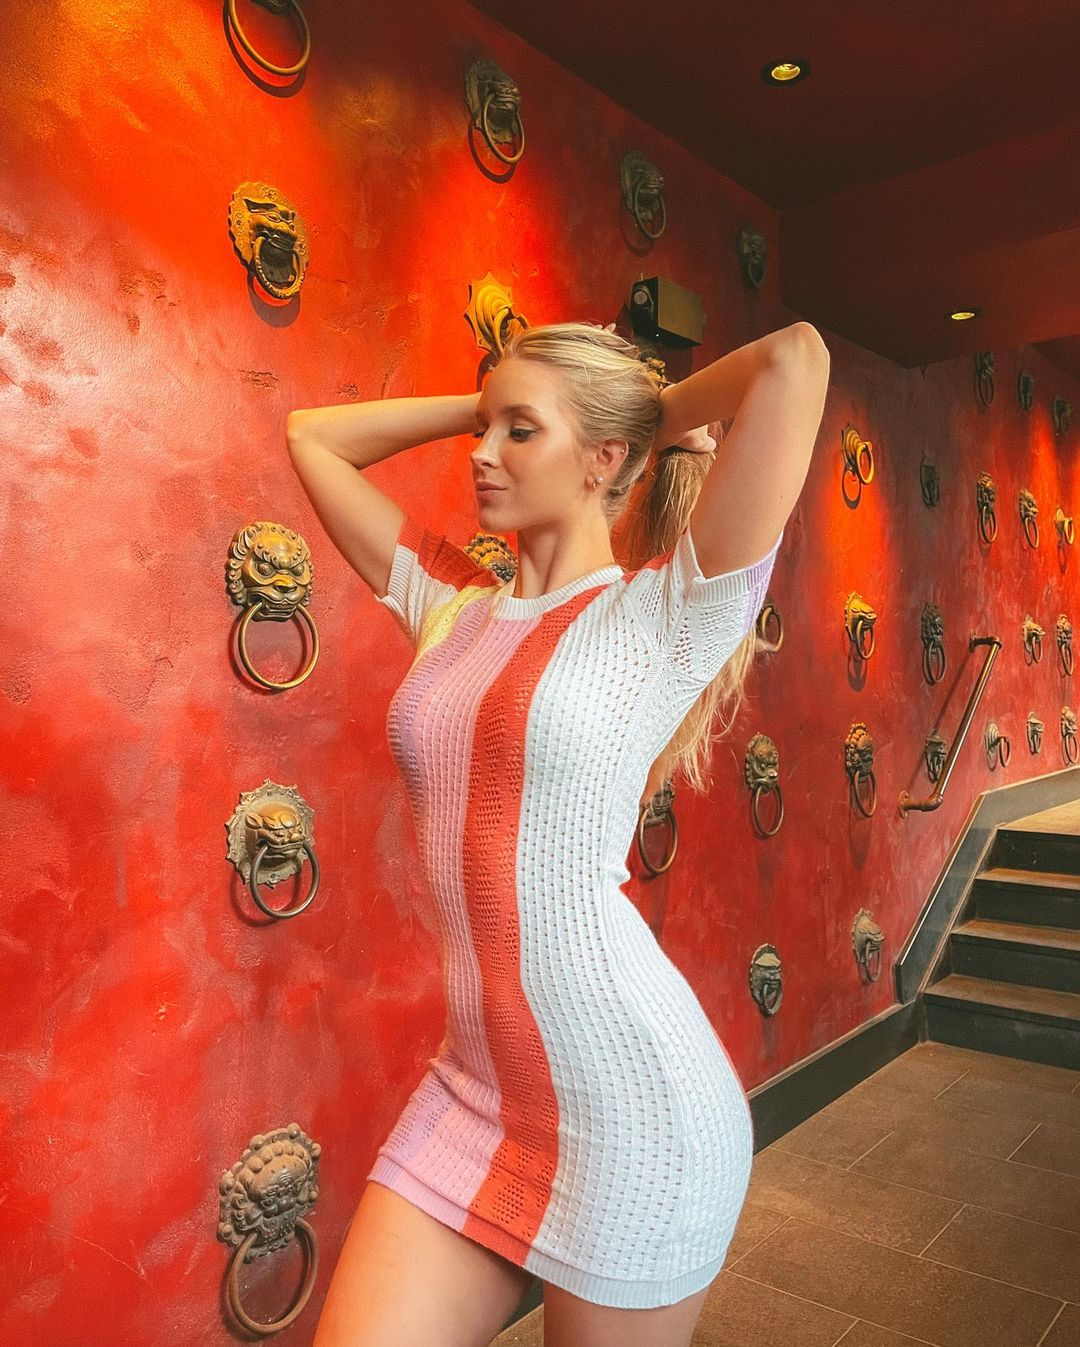 Caroline-Zalog-Wallpapers-Insta-Fit-Bio-7